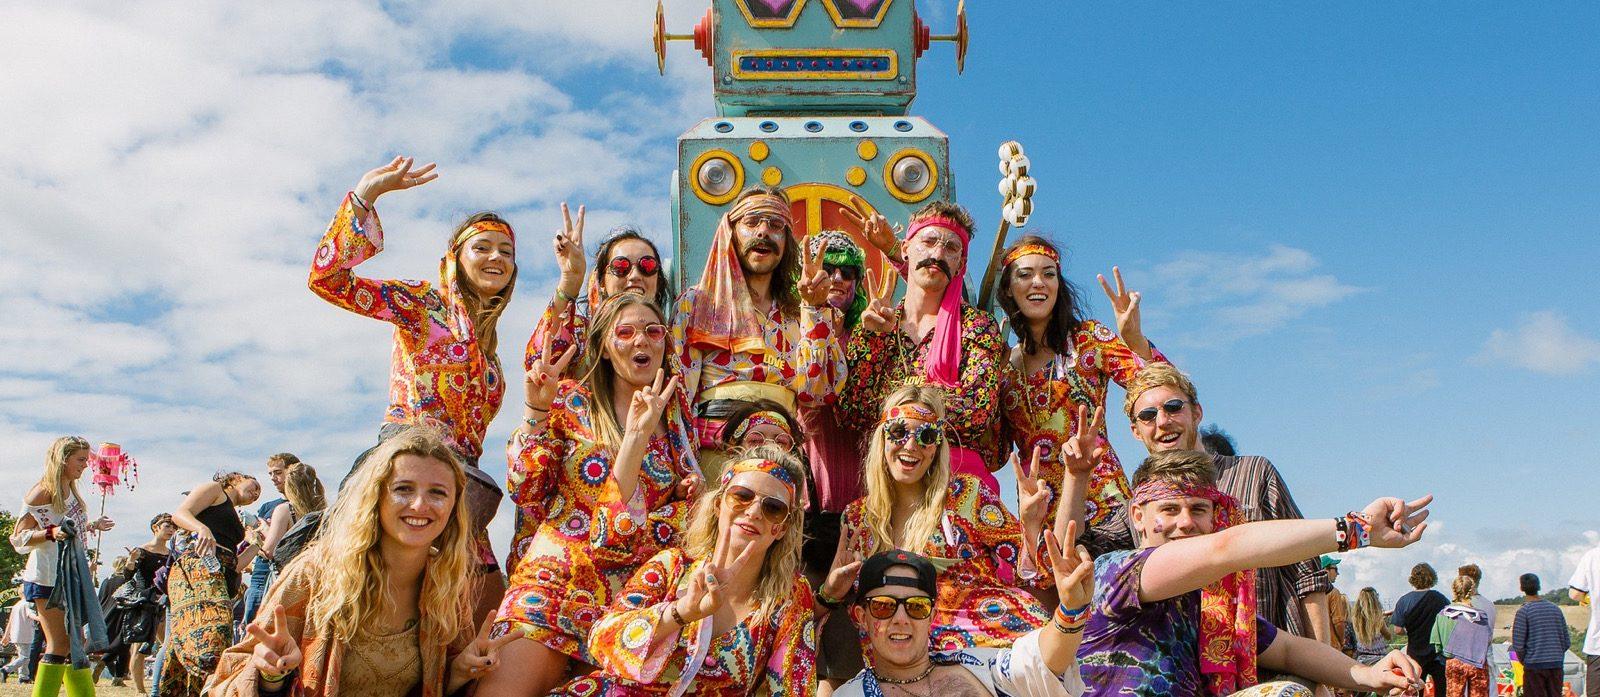 bestival-redbull-canli-yayin-festival